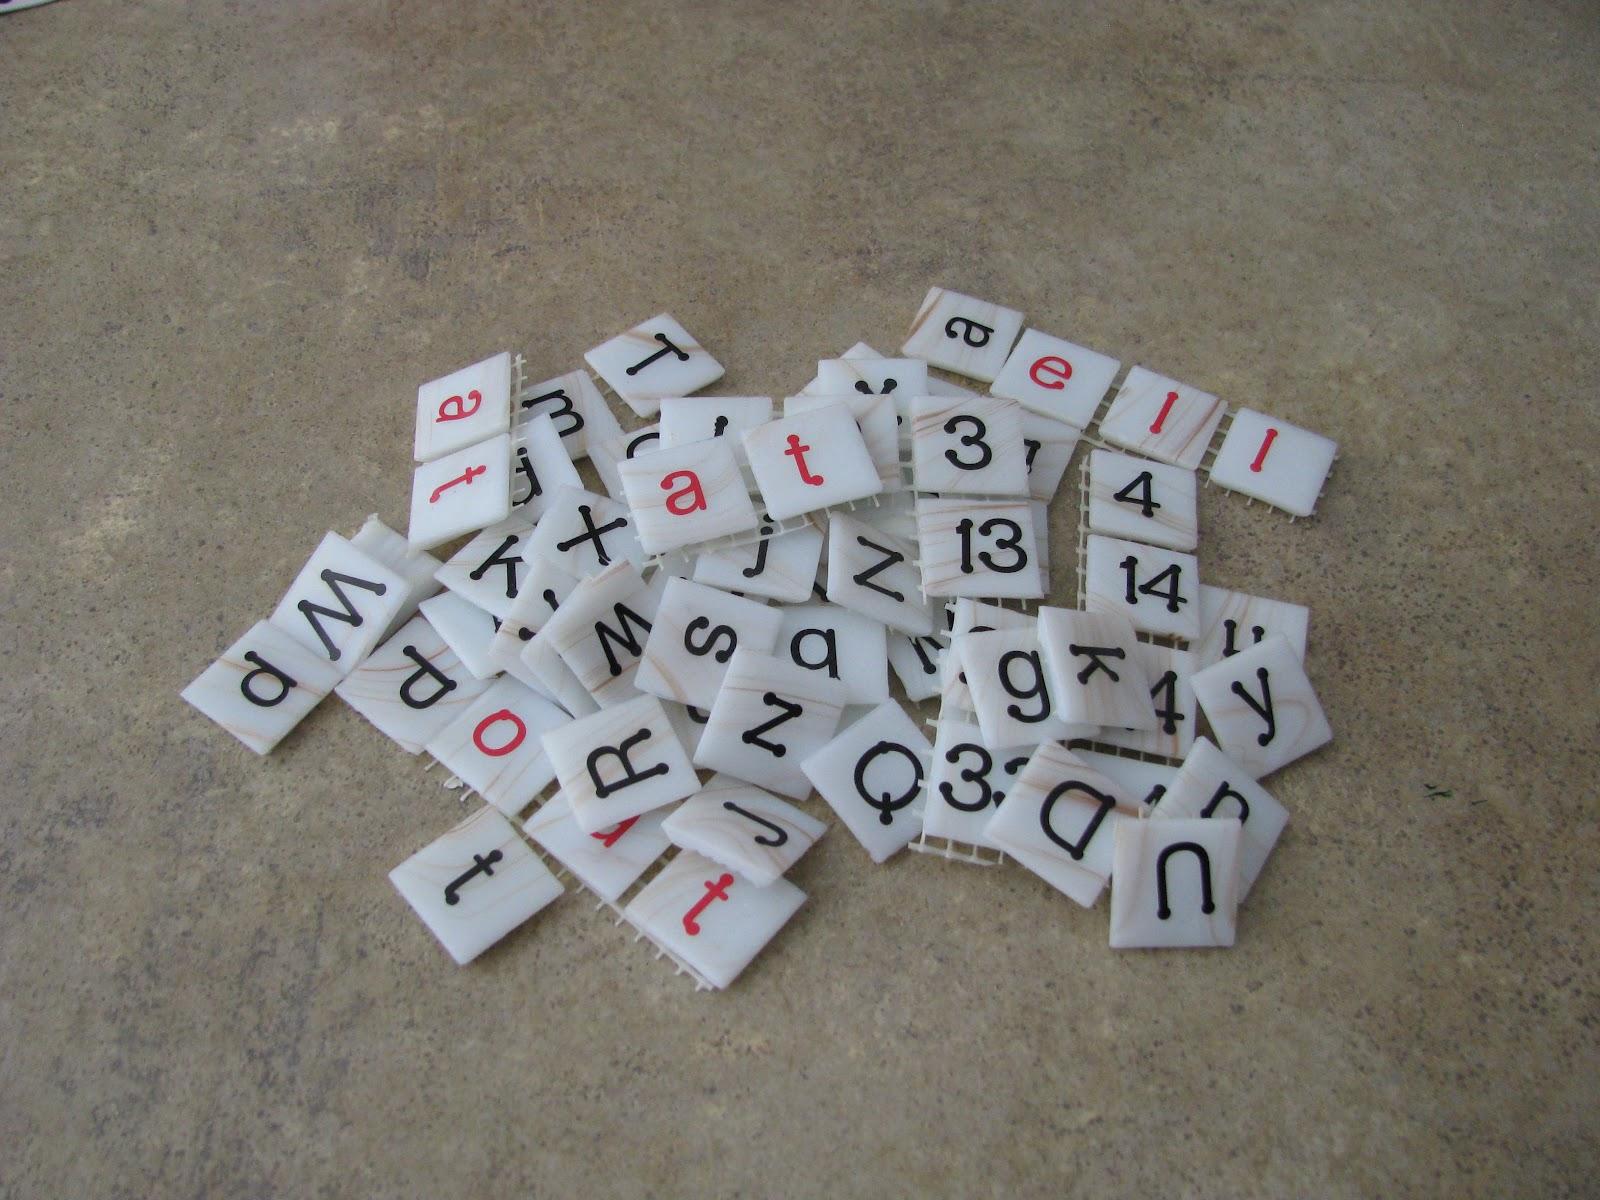 Mosaic Letter Tiles Timiznceptzmusic